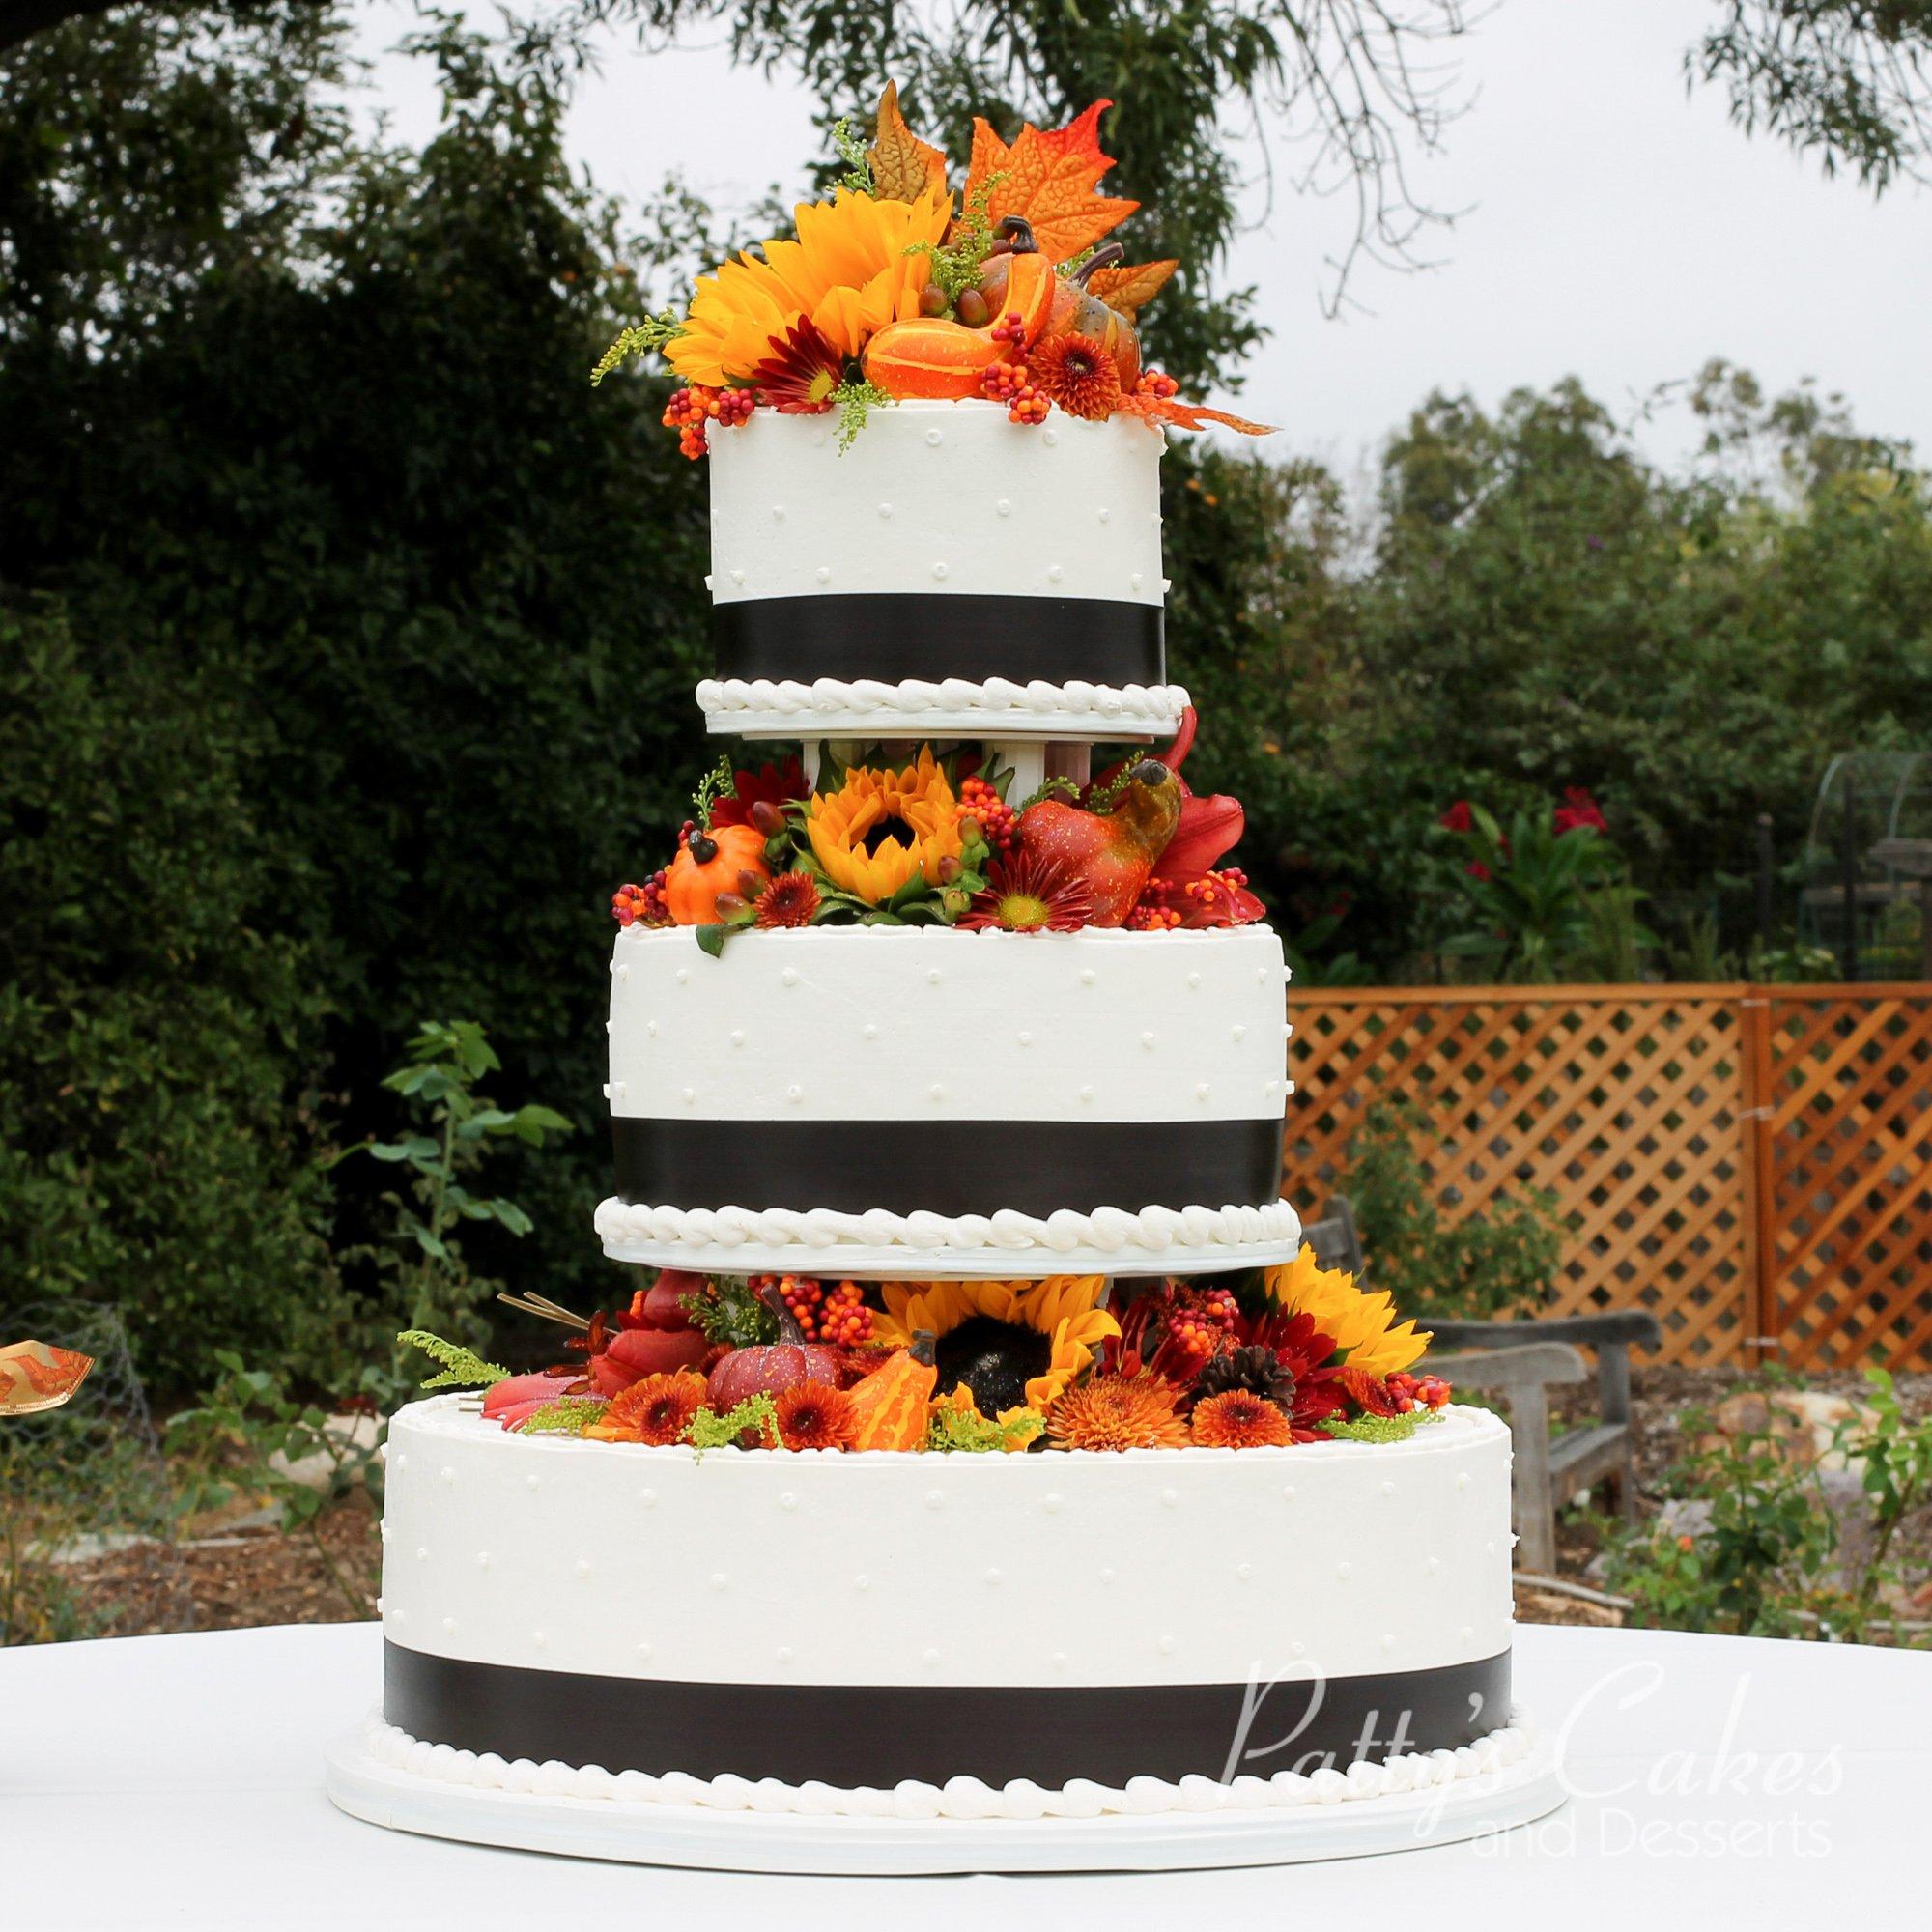 Photo Of A Fall Wedding Cake